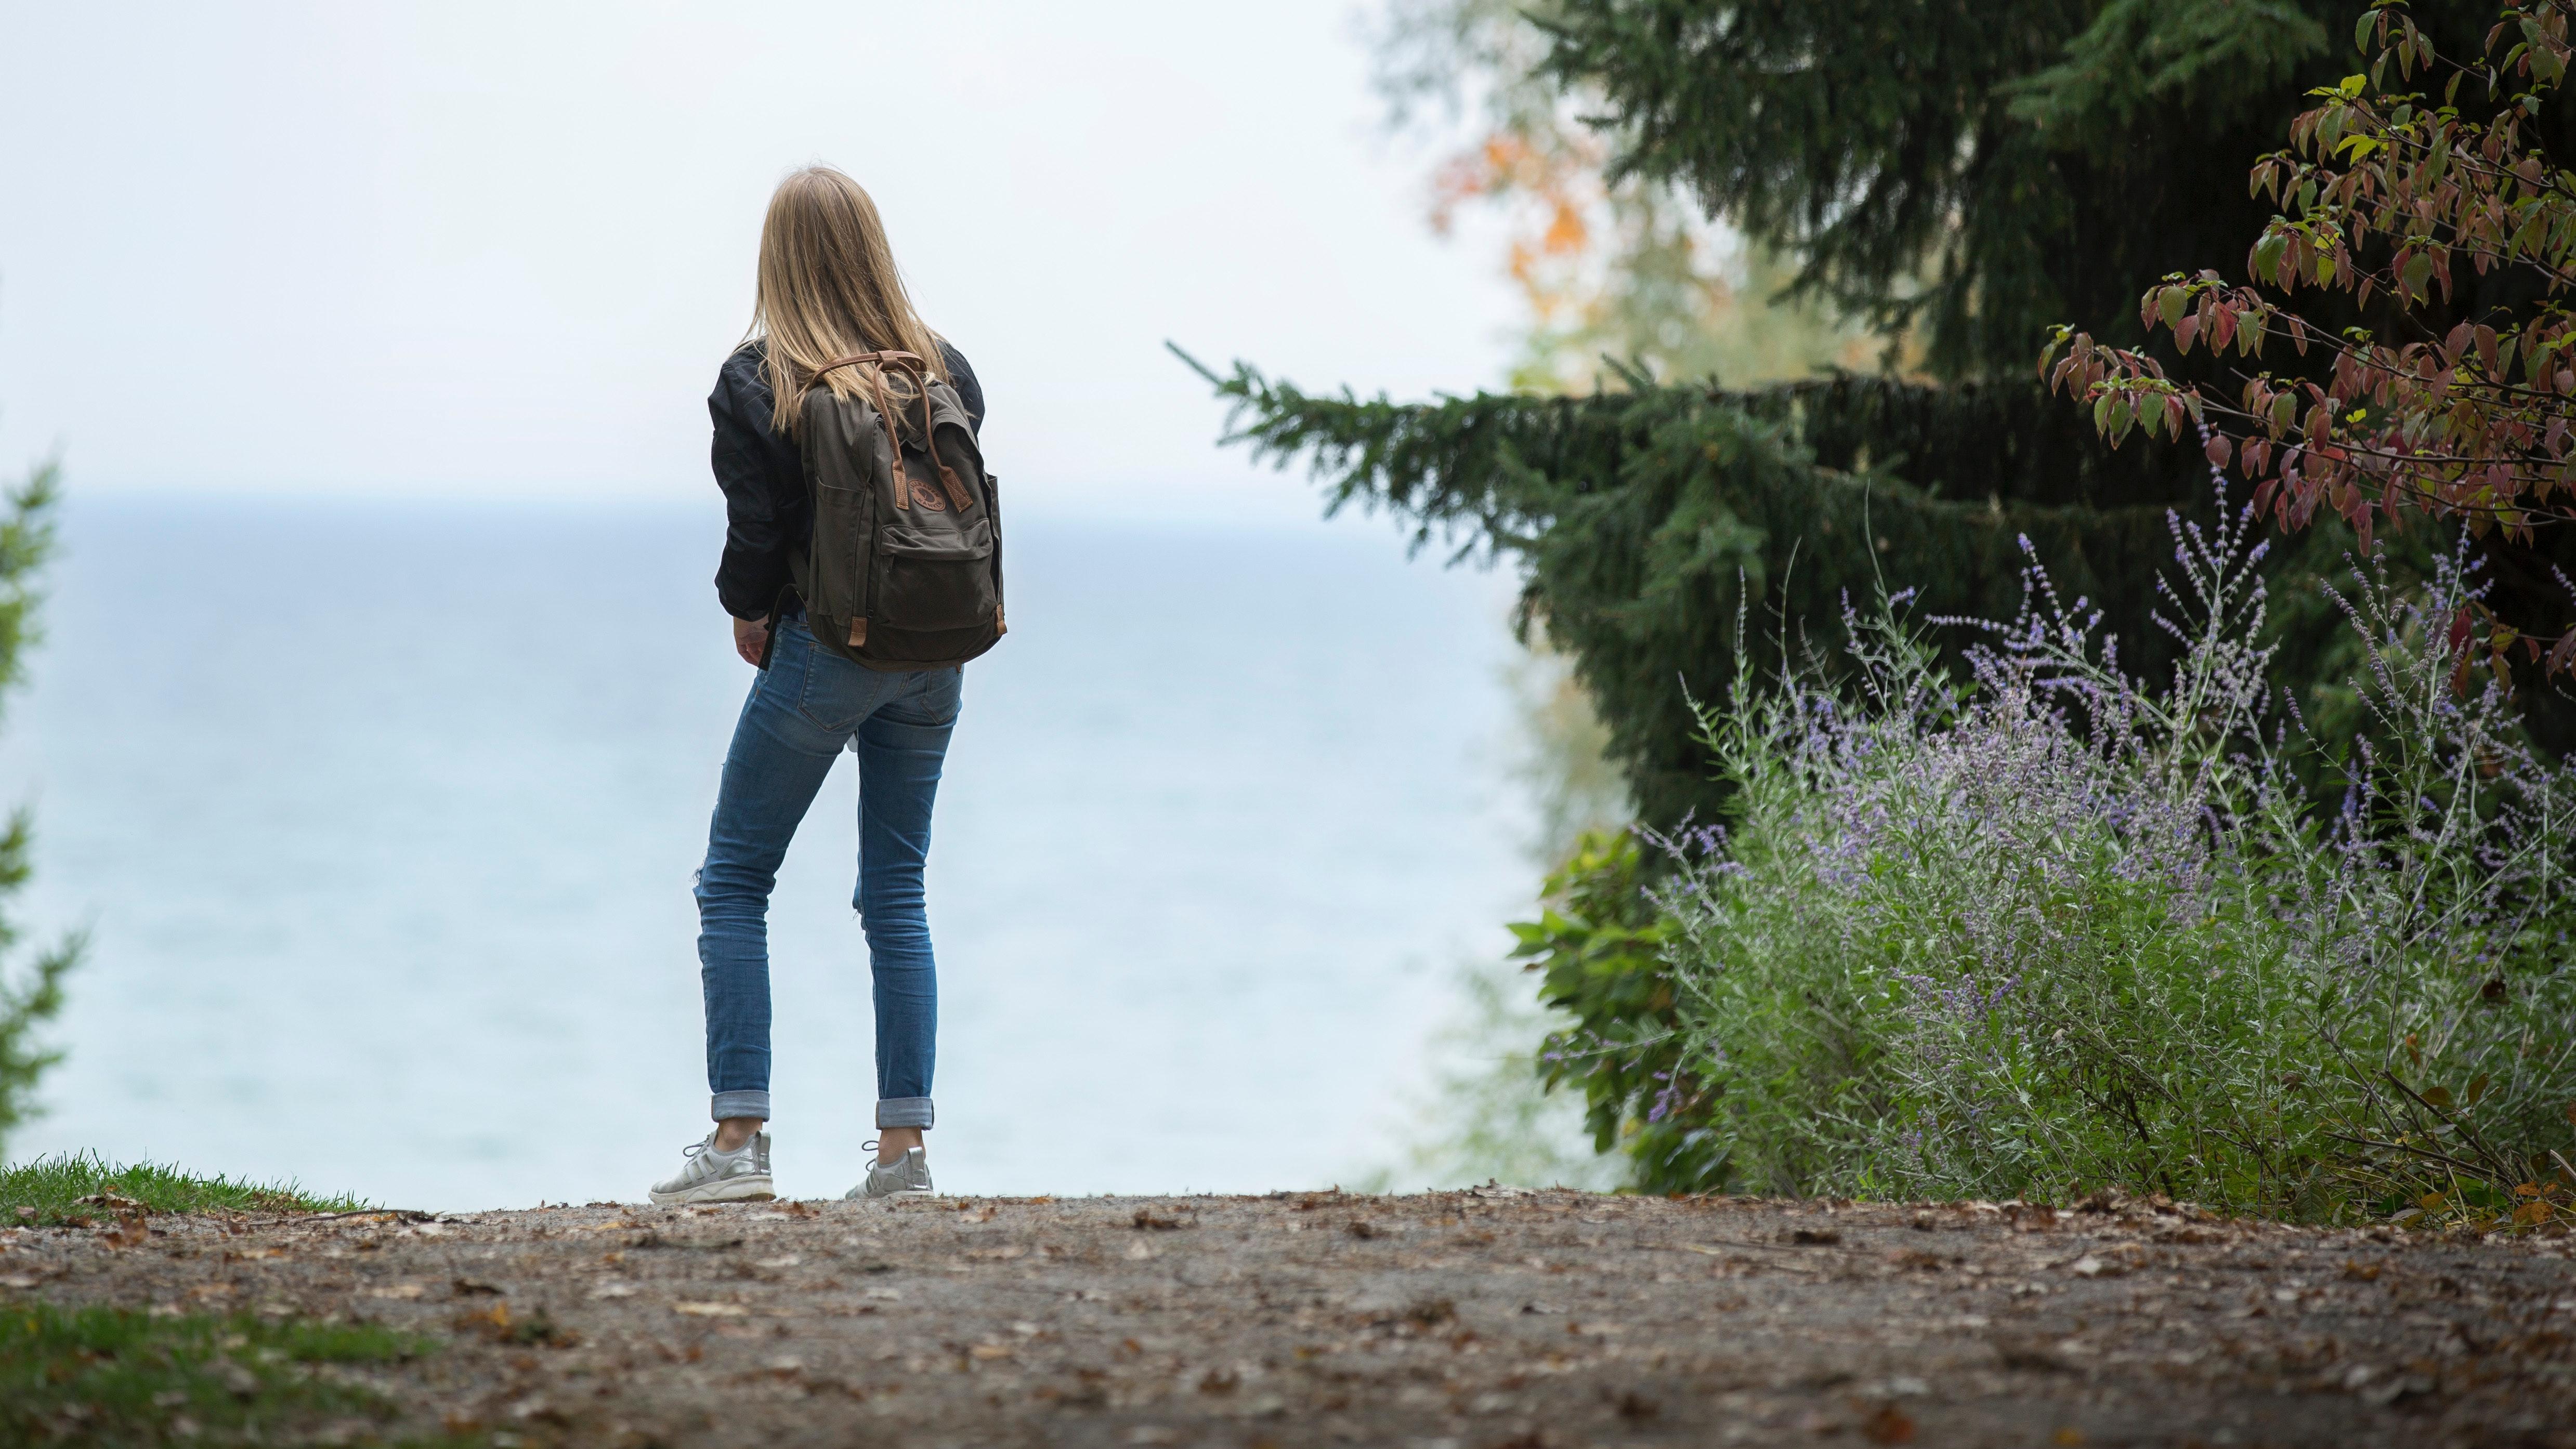 adventure-backpack-beach-214575